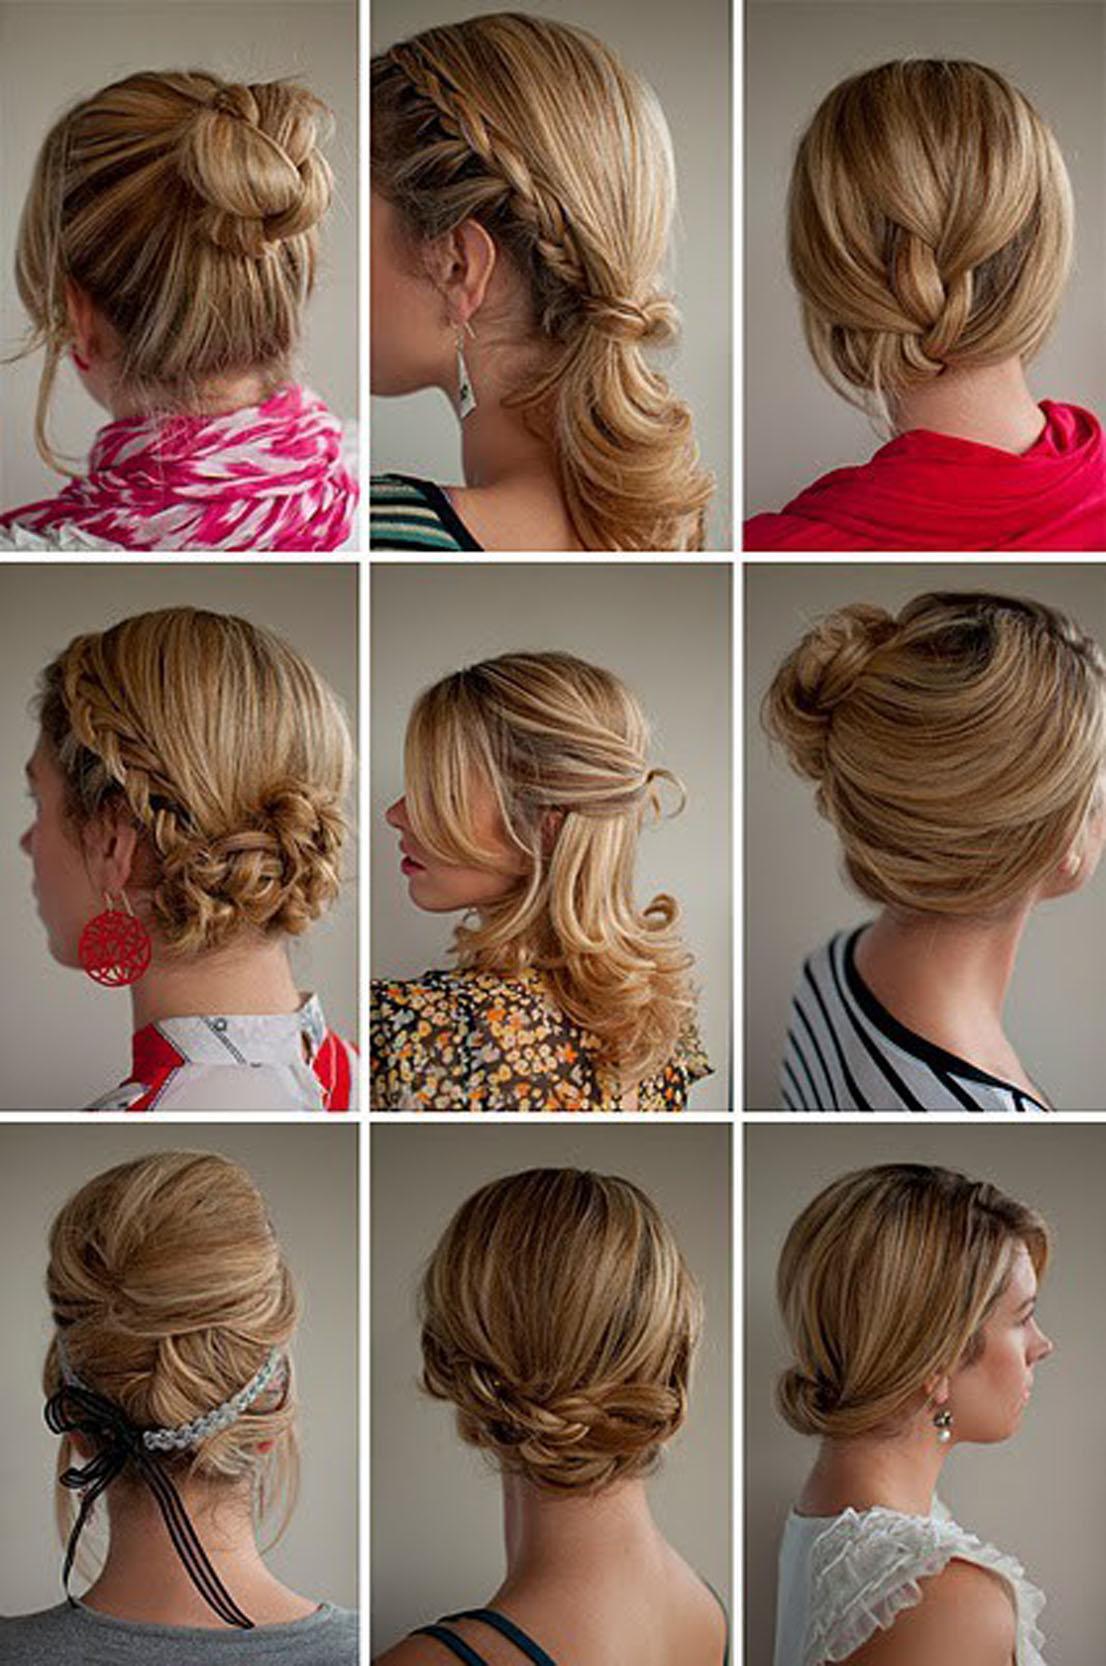 Swell Easy Ways To Braid Hair Borbotta Com Short Hairstyles For Black Women Fulllsitofus